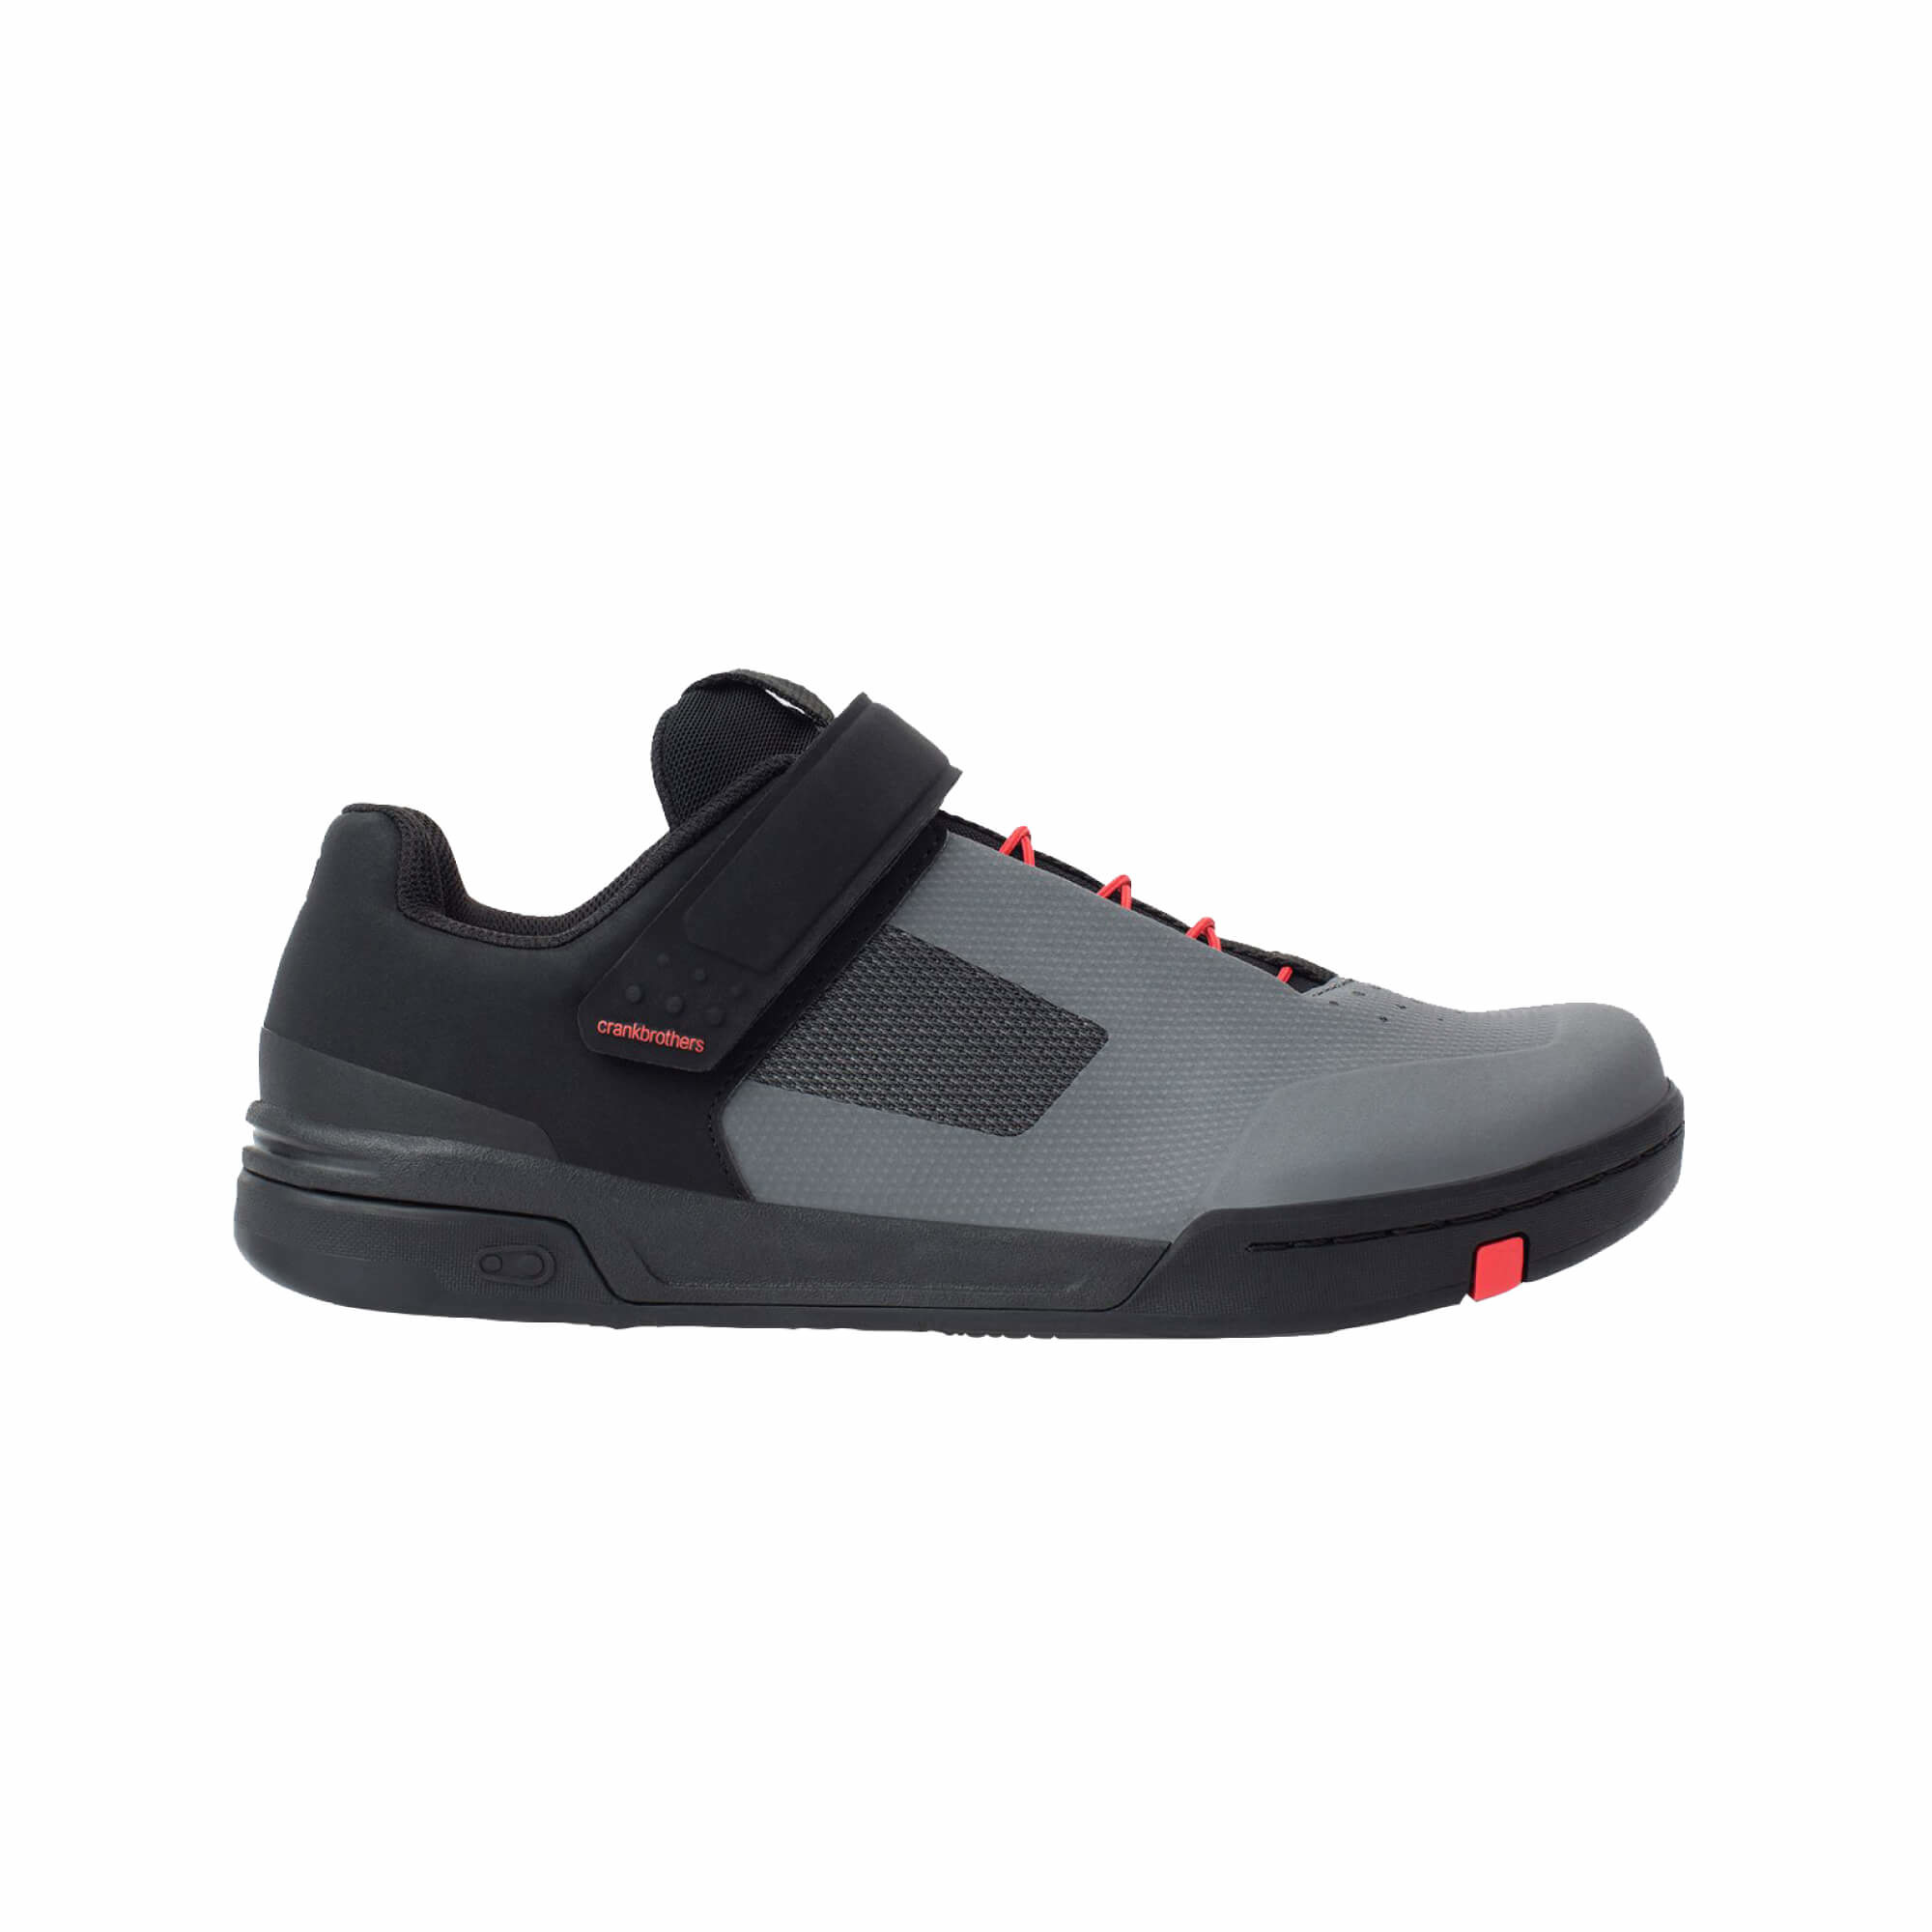 Shoes Stamp Speedlace Flat-1